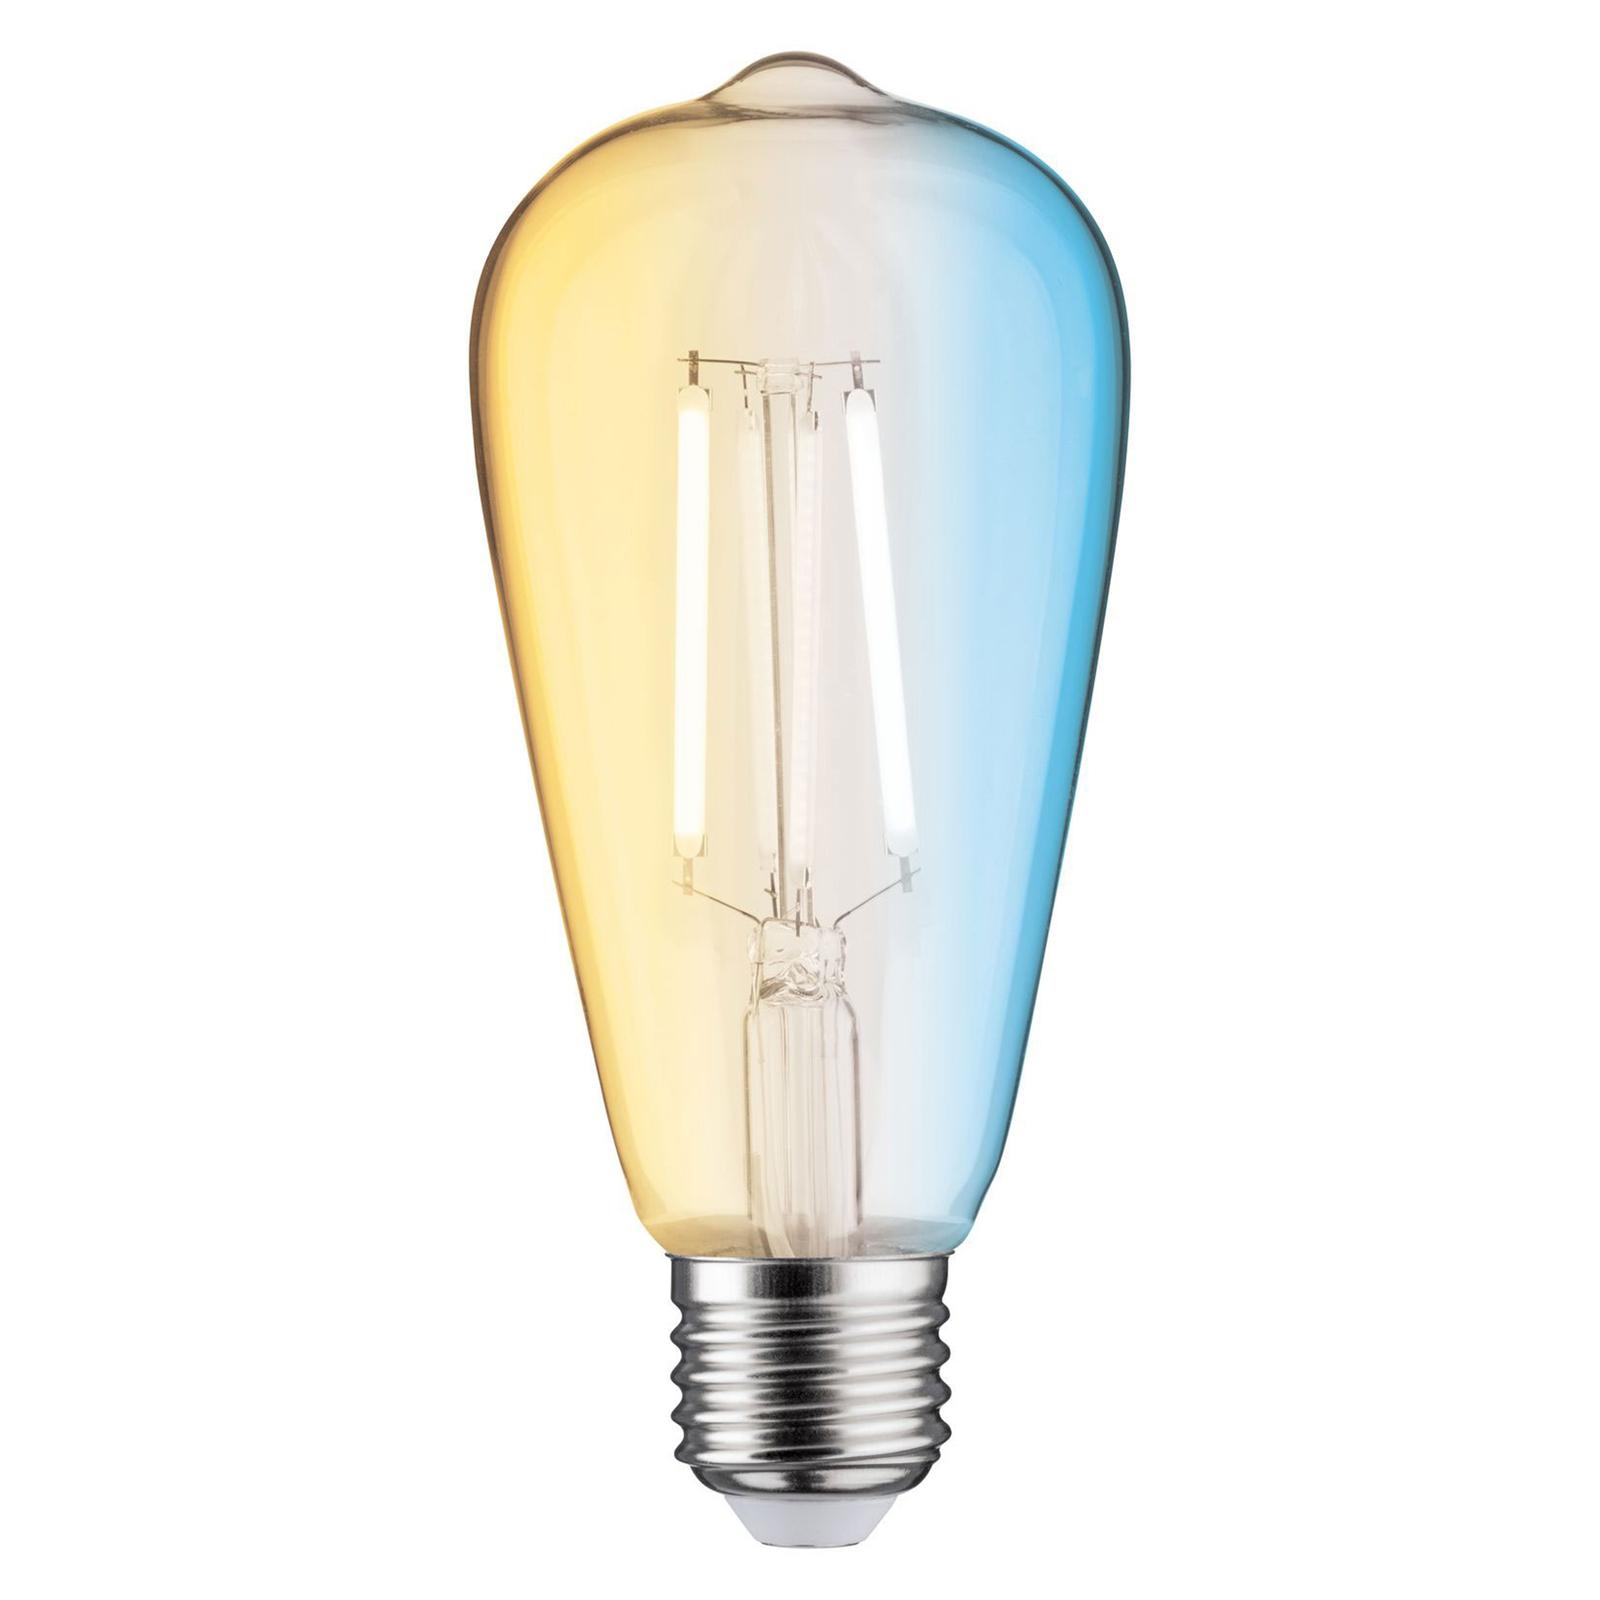 Paulmann LED rustica E27 7W Zigbee, CCT Illuminazione per interni